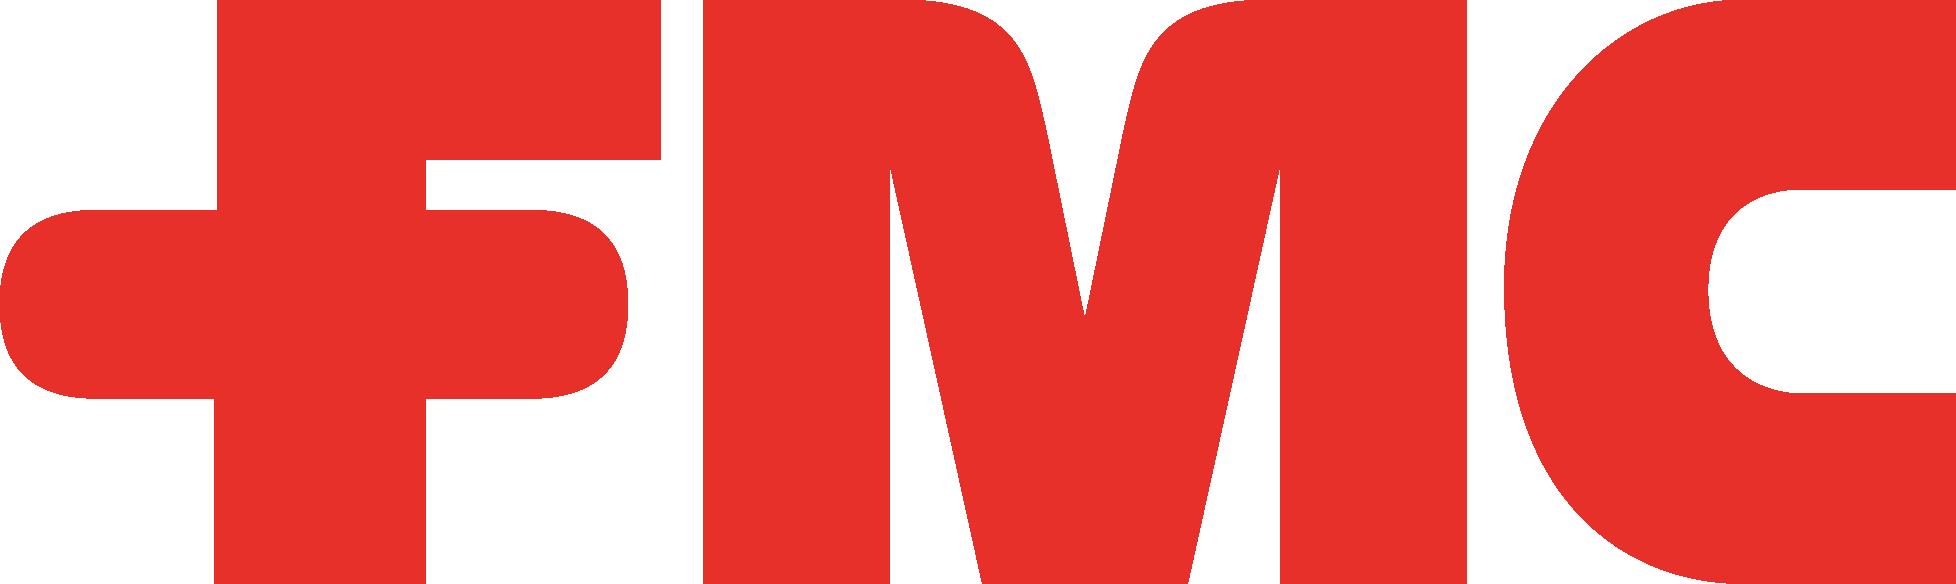 FMC Corporation Logo png